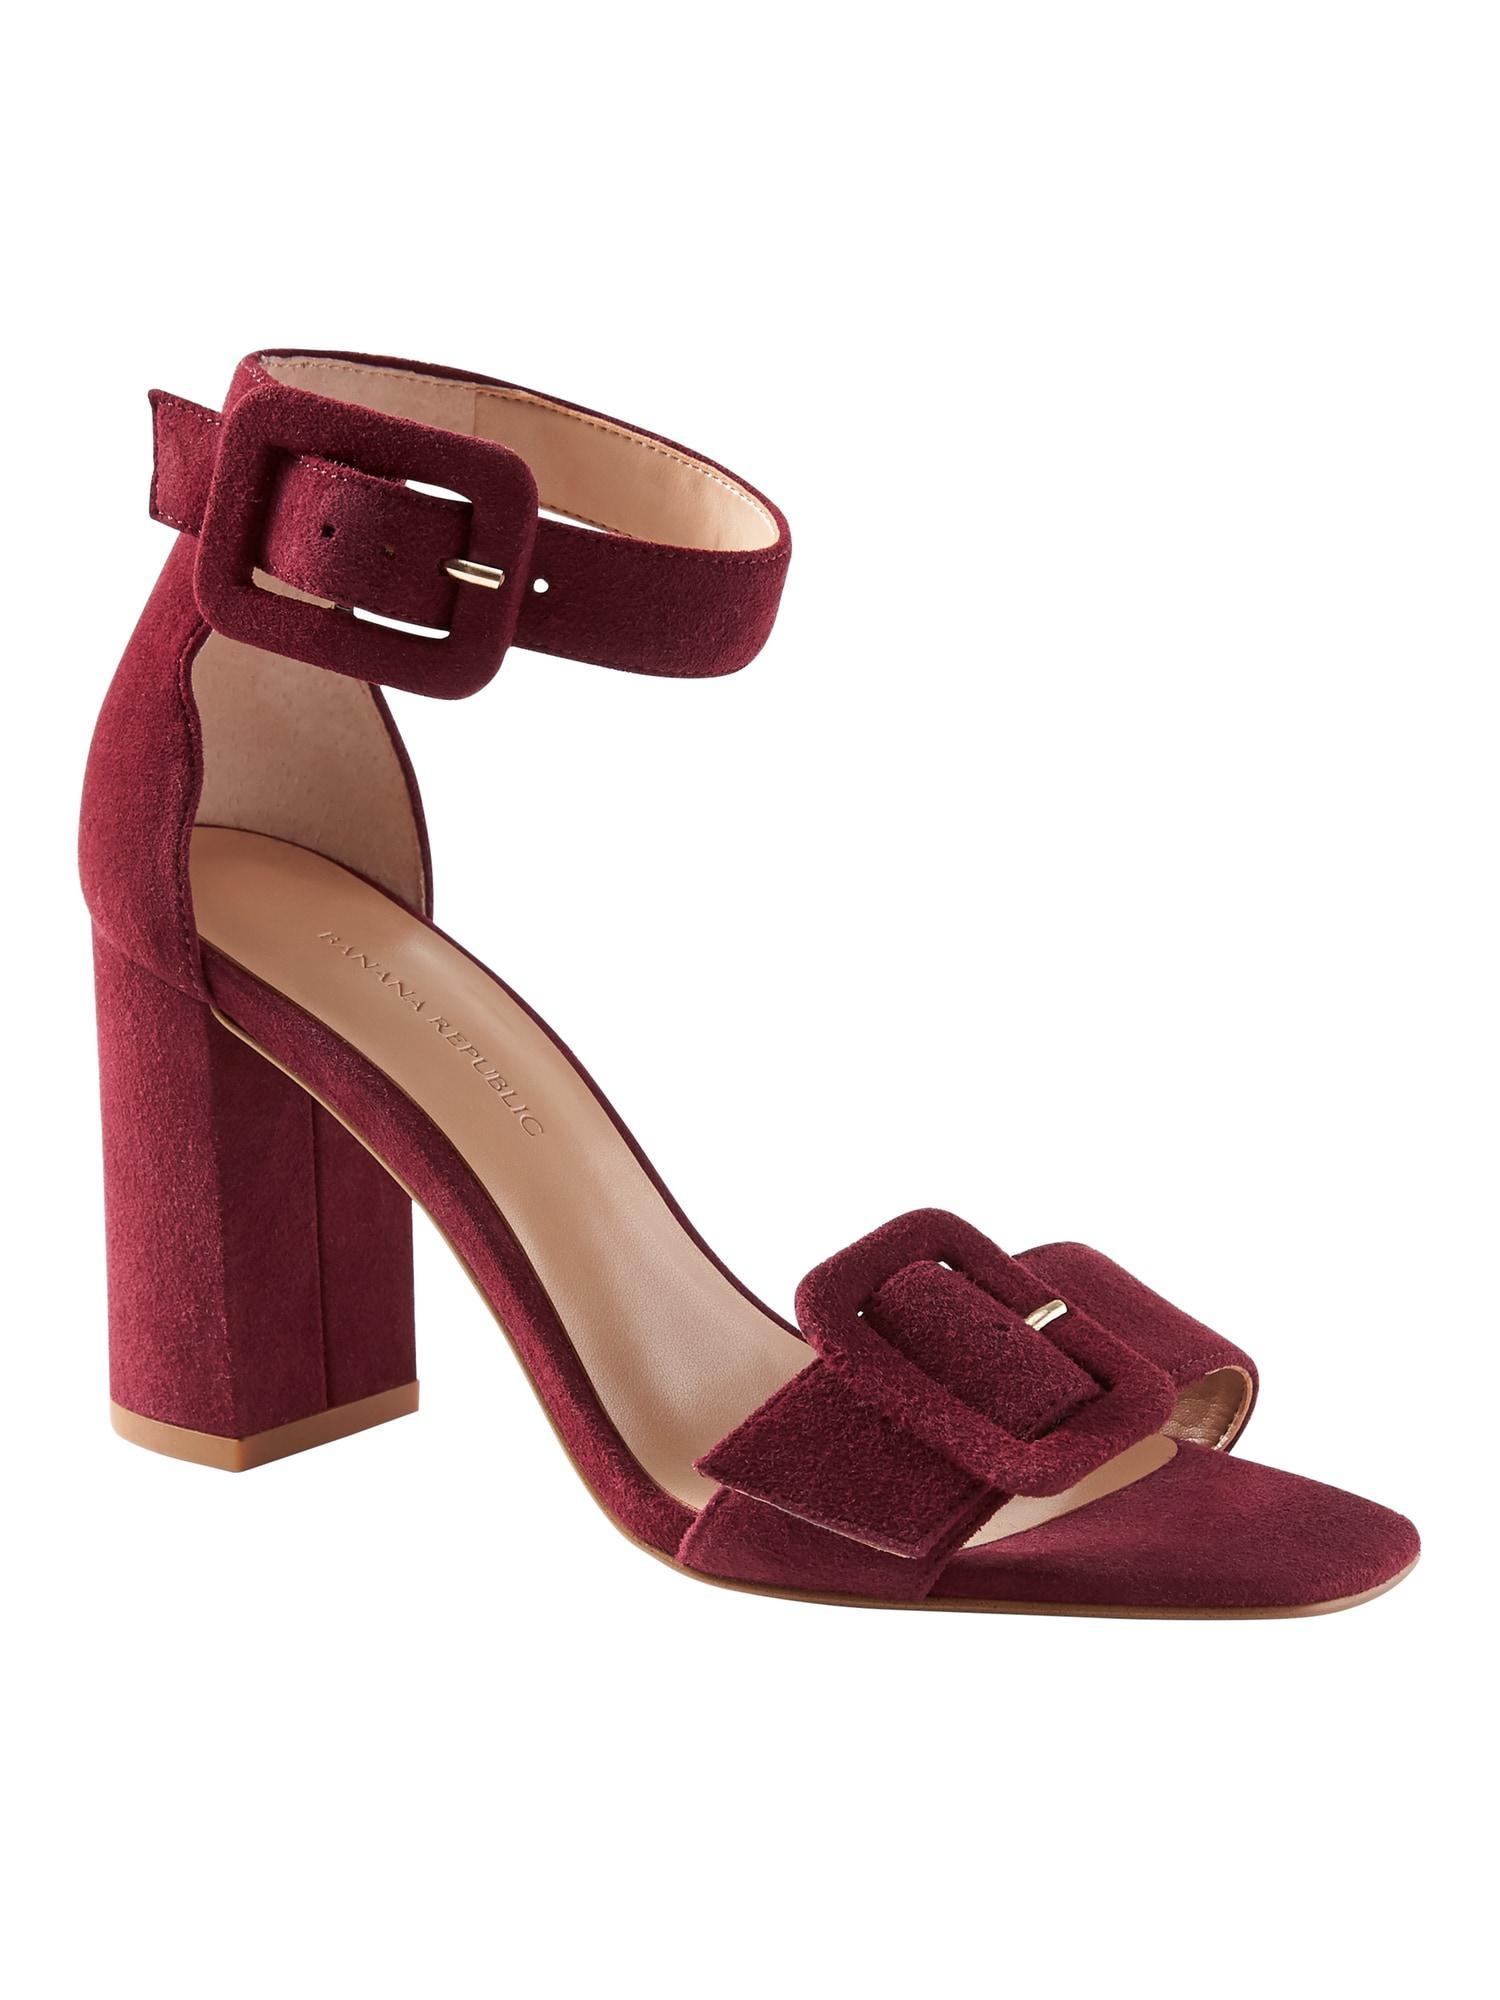 920790486fd Lyst - Banana Republic Buckle Block-heel Sandal in Red